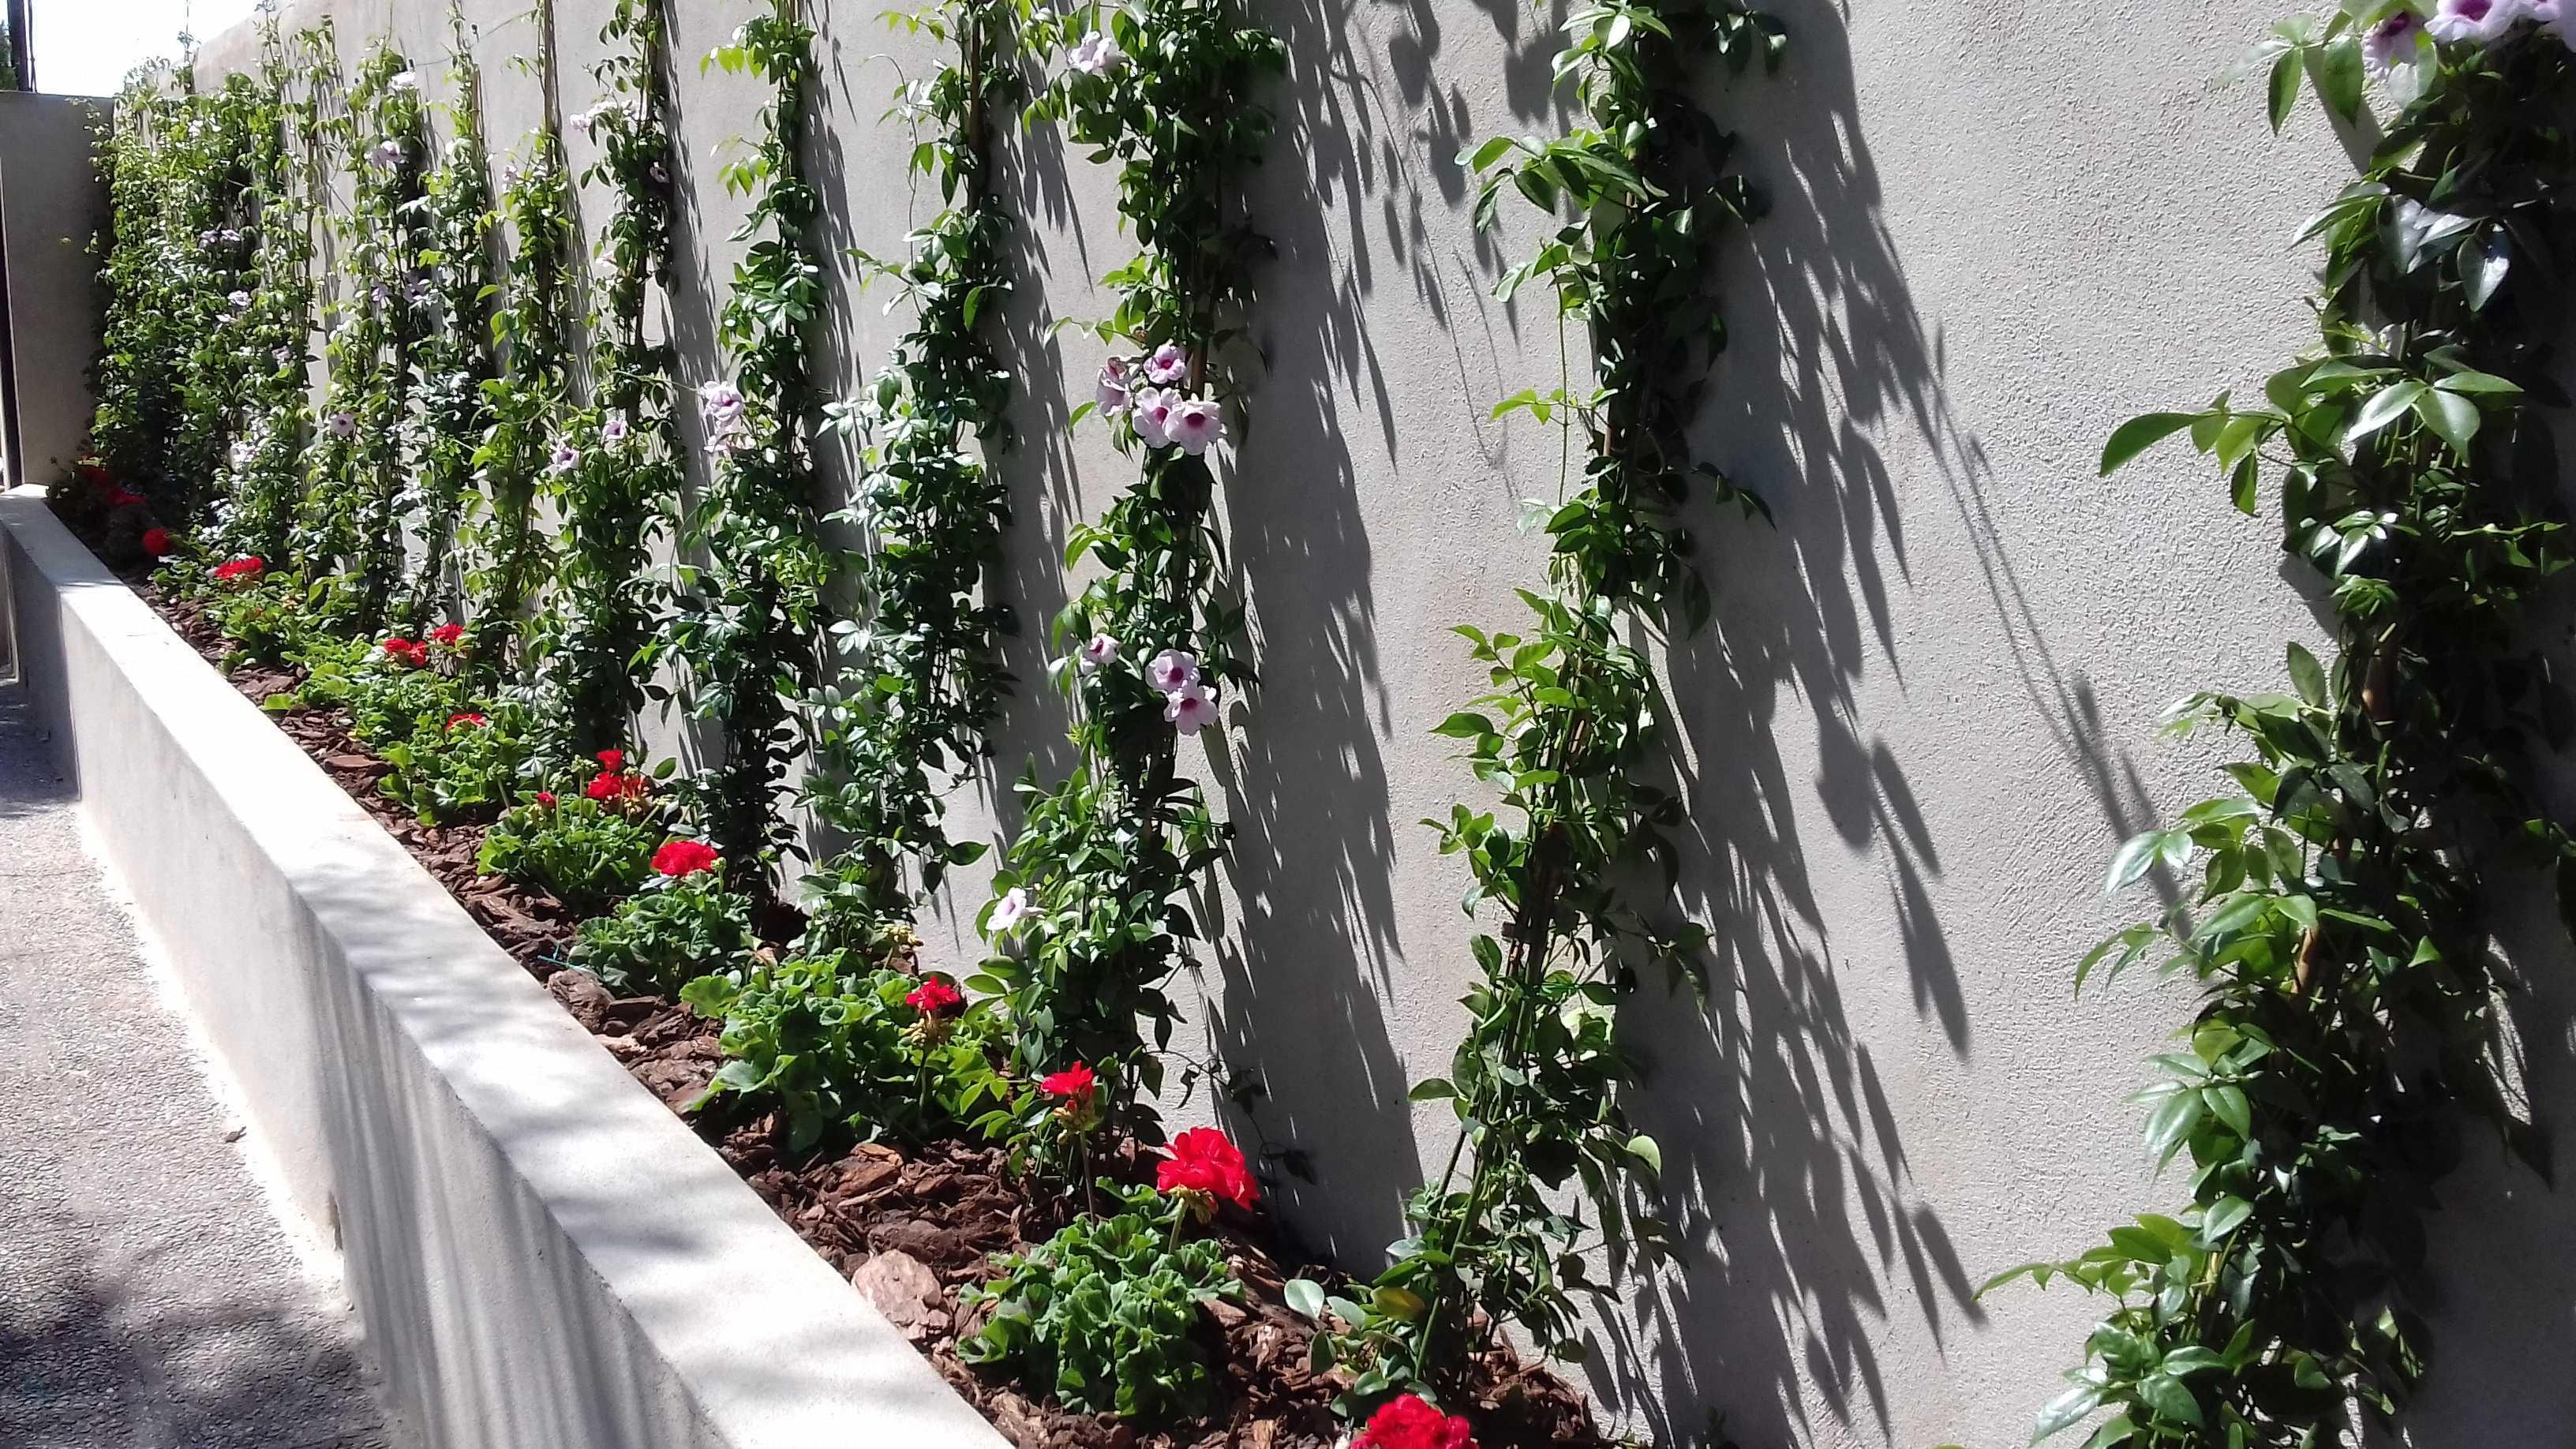 Jardín privado. La Pobla de Vallbona, Valencia.